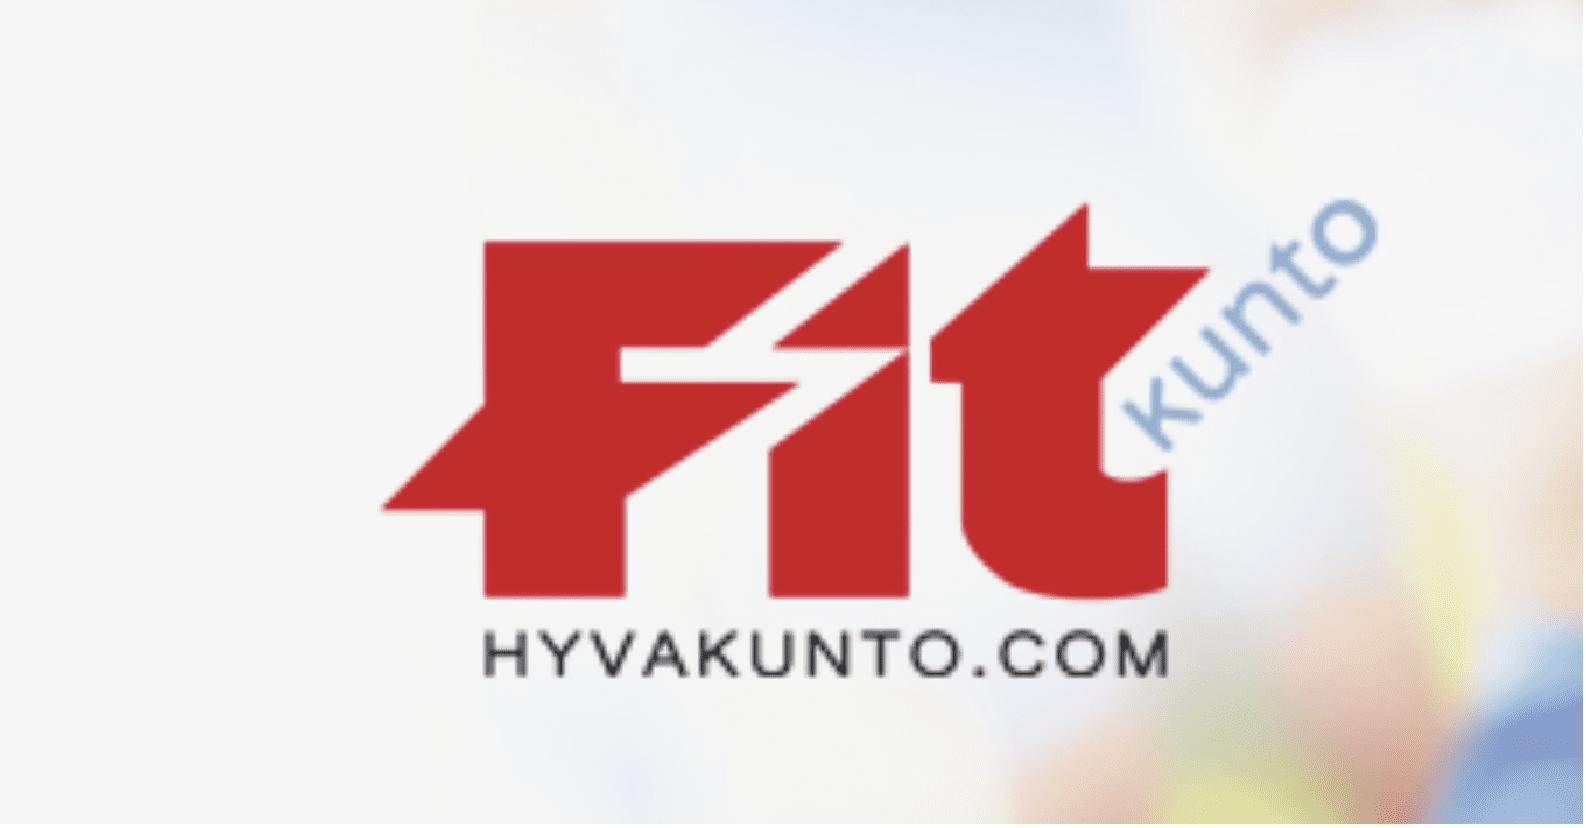 Fit Kunto